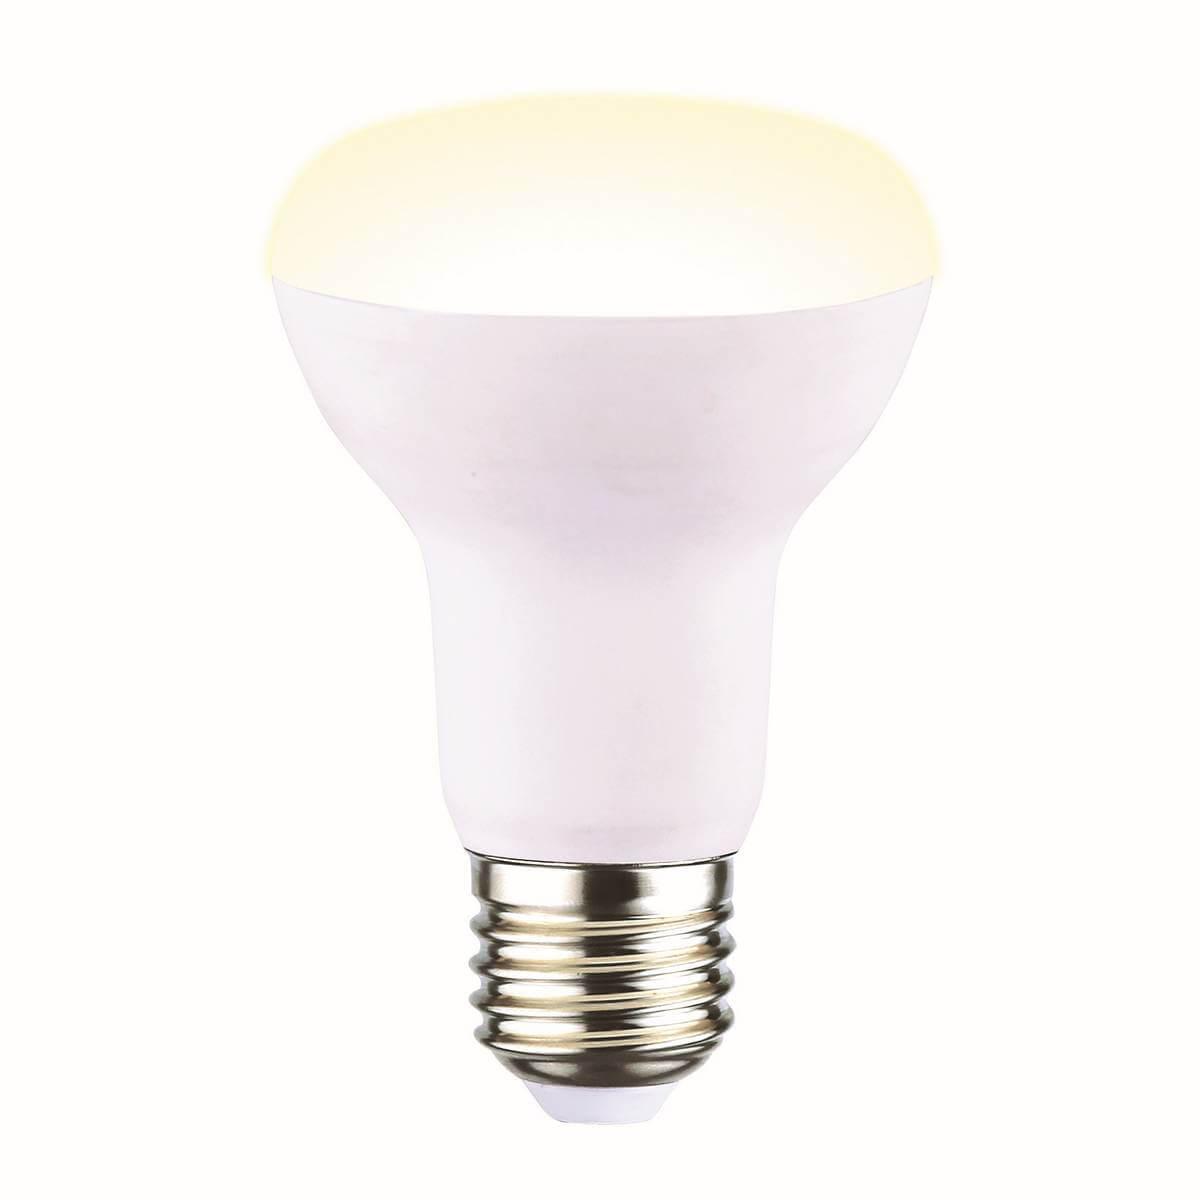 цена на Лампочка Volpe LED-R63-11W/3000K/E27/FR/NR Norma